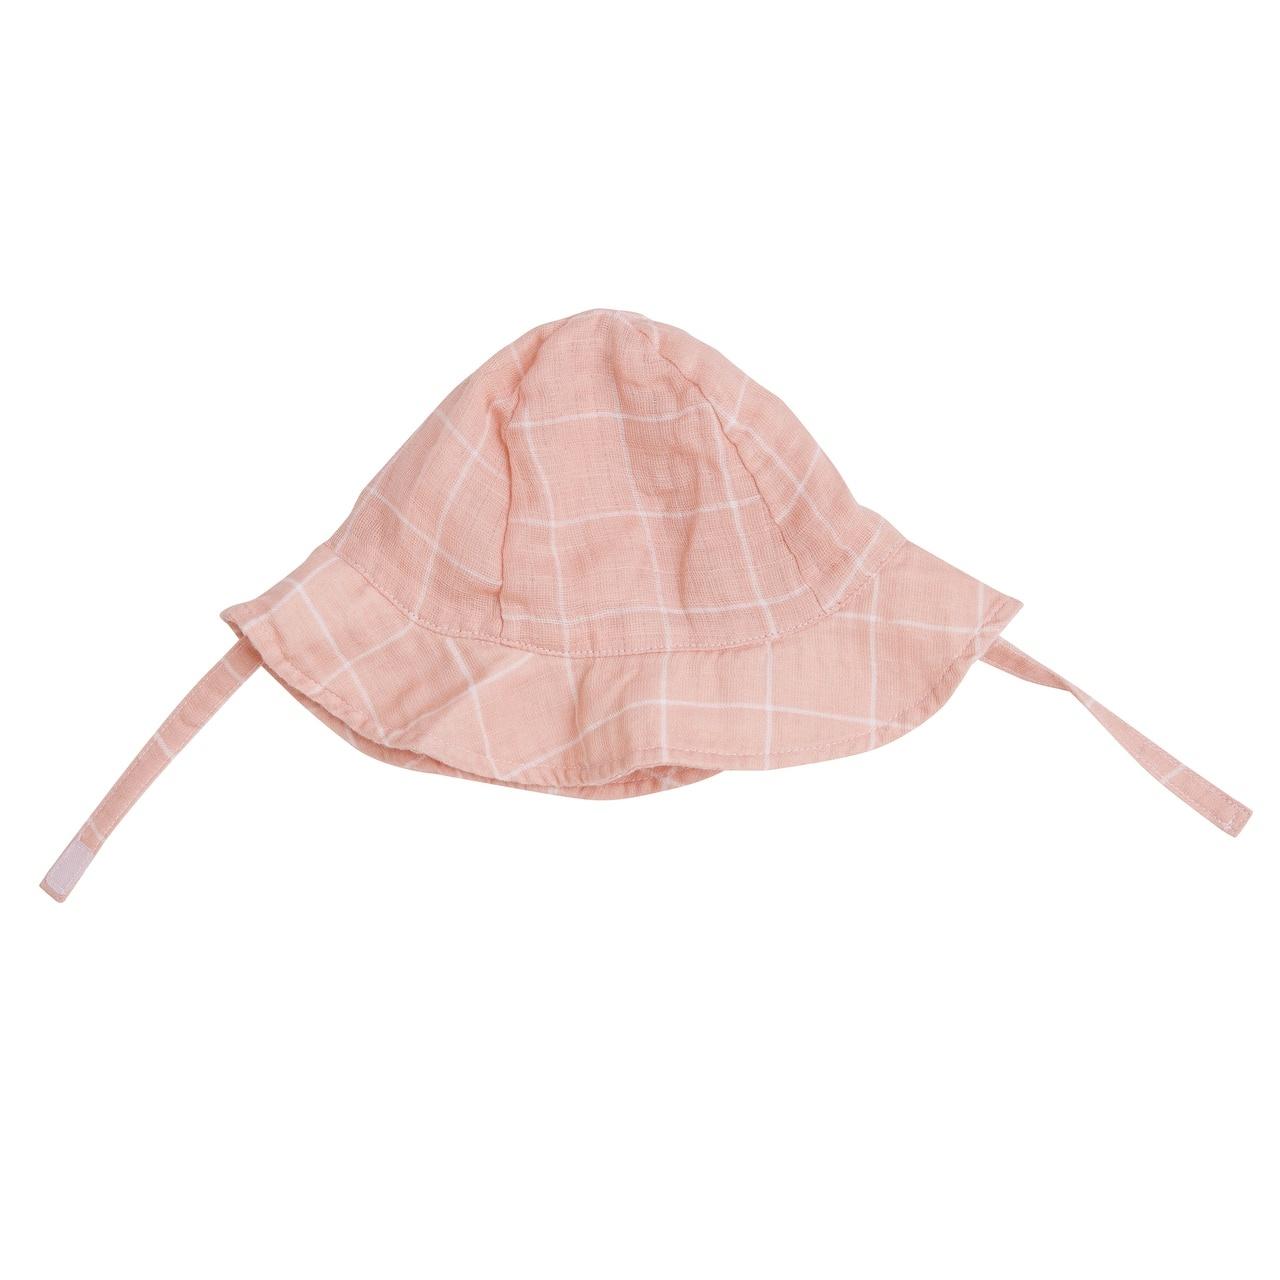 Angel Dear Off The Grid Sunhat - Pink